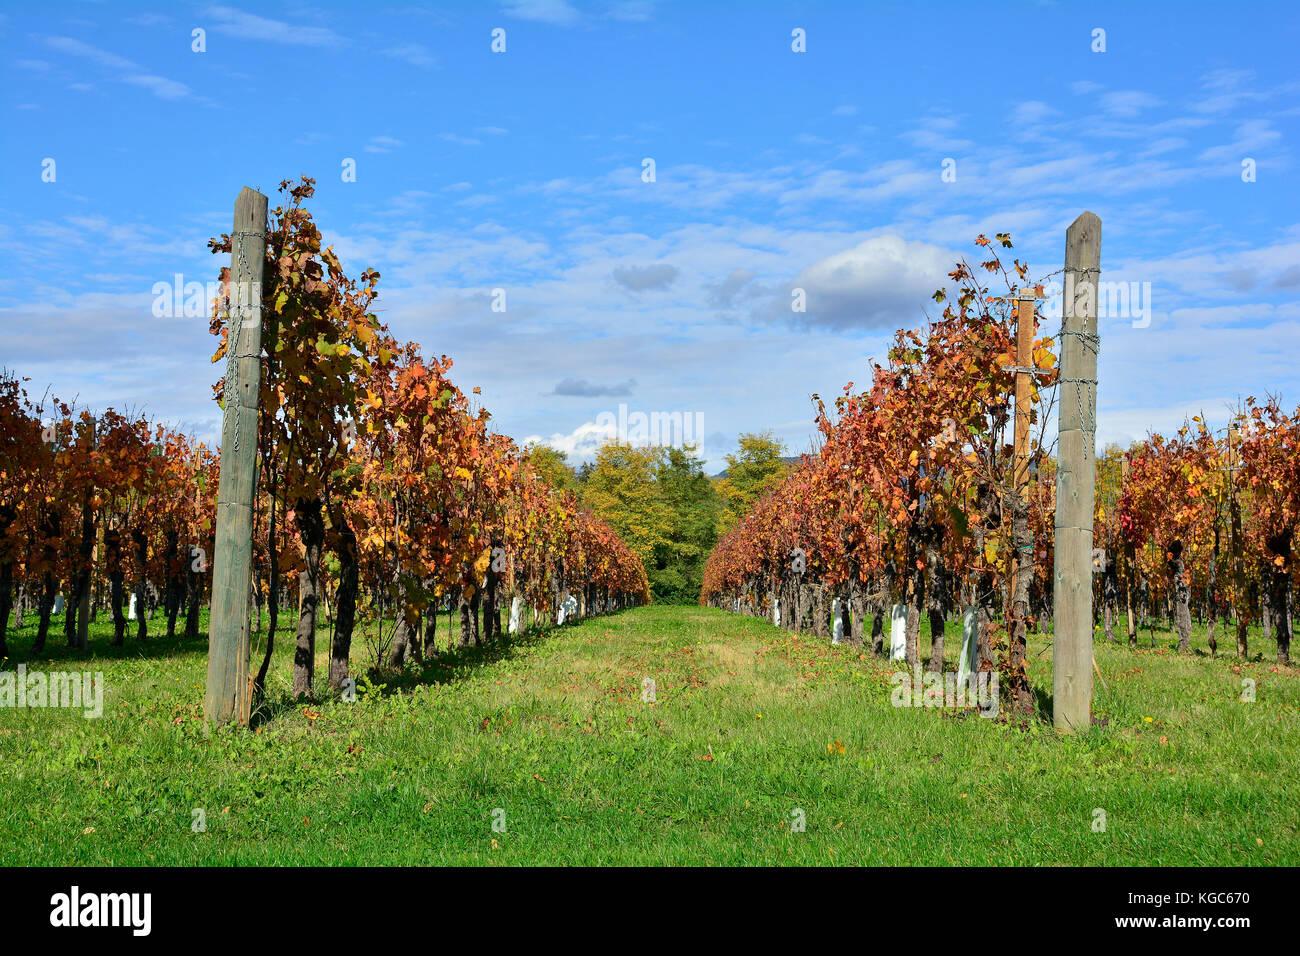 Autumnal rows of grape vines in late October in the north east Italian region of Friuli Venezia Giulia. Stock Photo